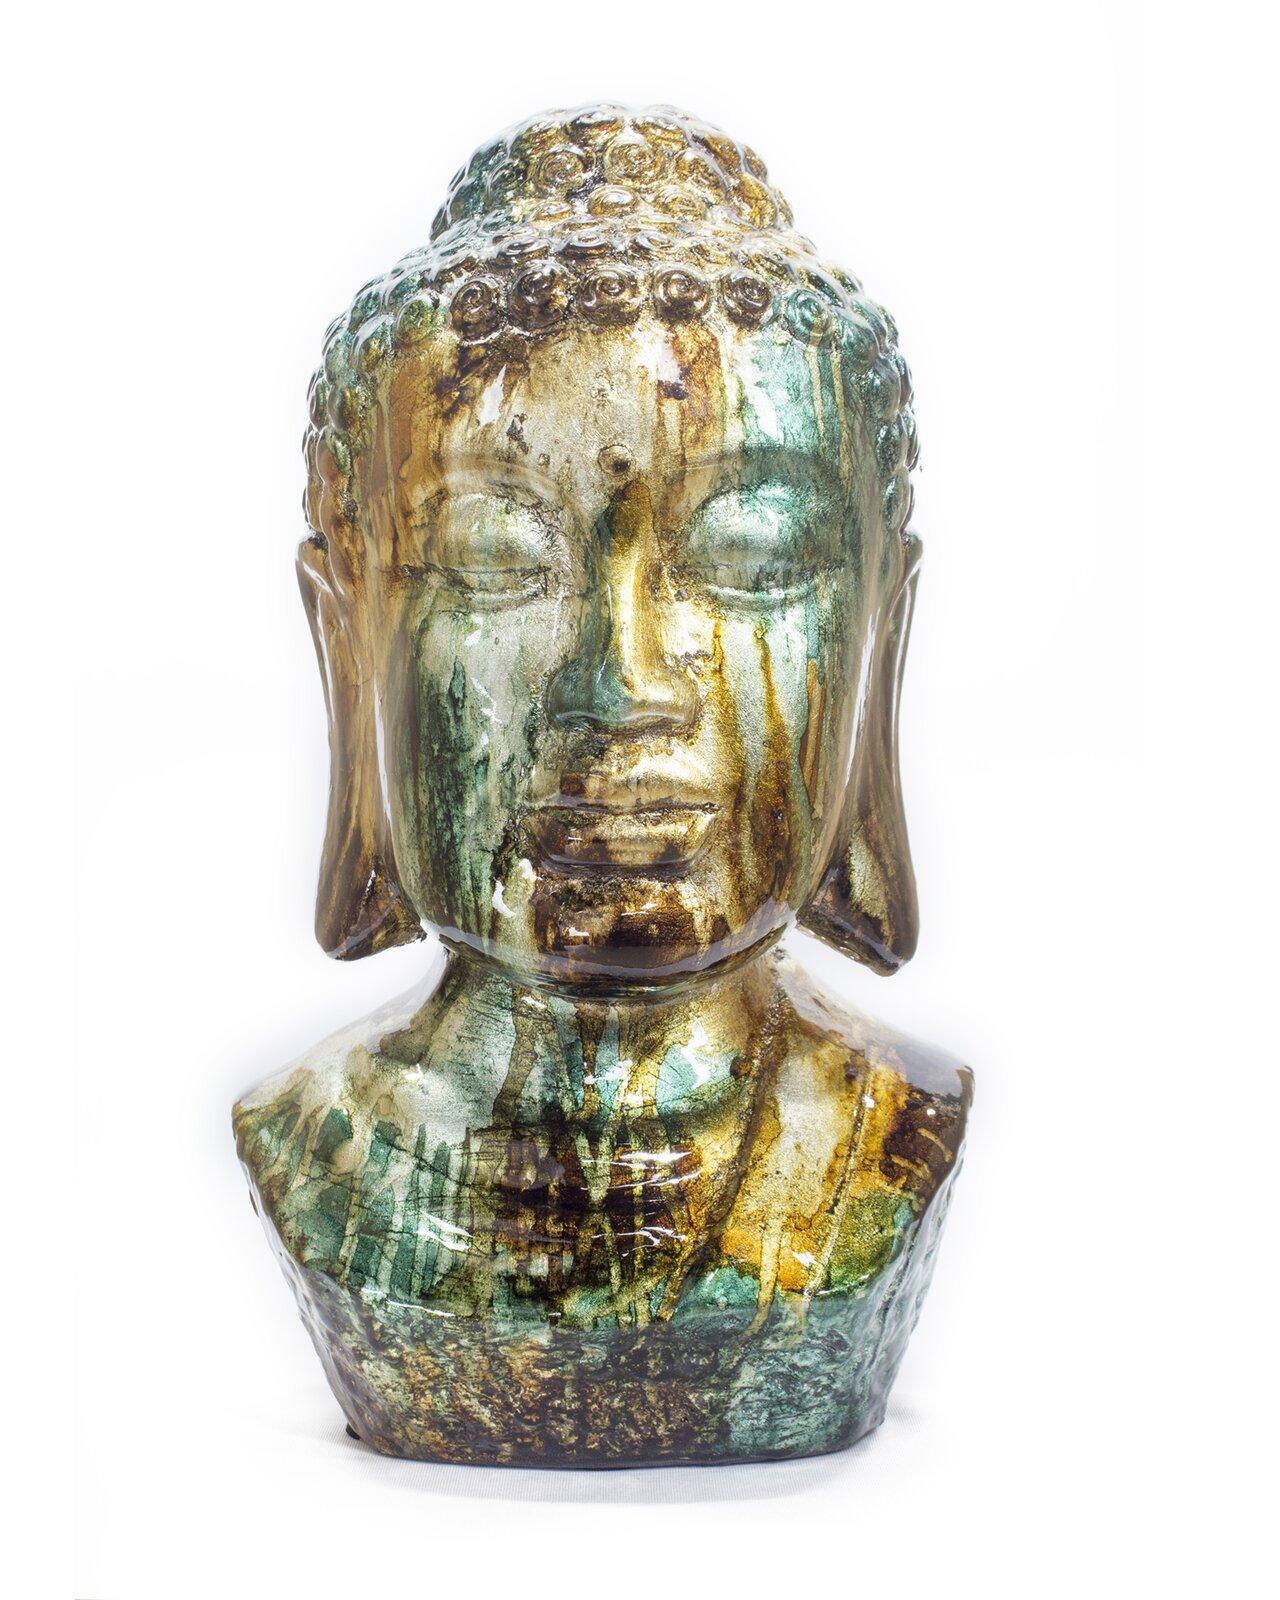 modern-buddha-head-statue-colorful-pearlescent-glaze-teal-and-orange-coloration-14-inches-tall-glossy-finish-unique-spiritual-decor-ideas